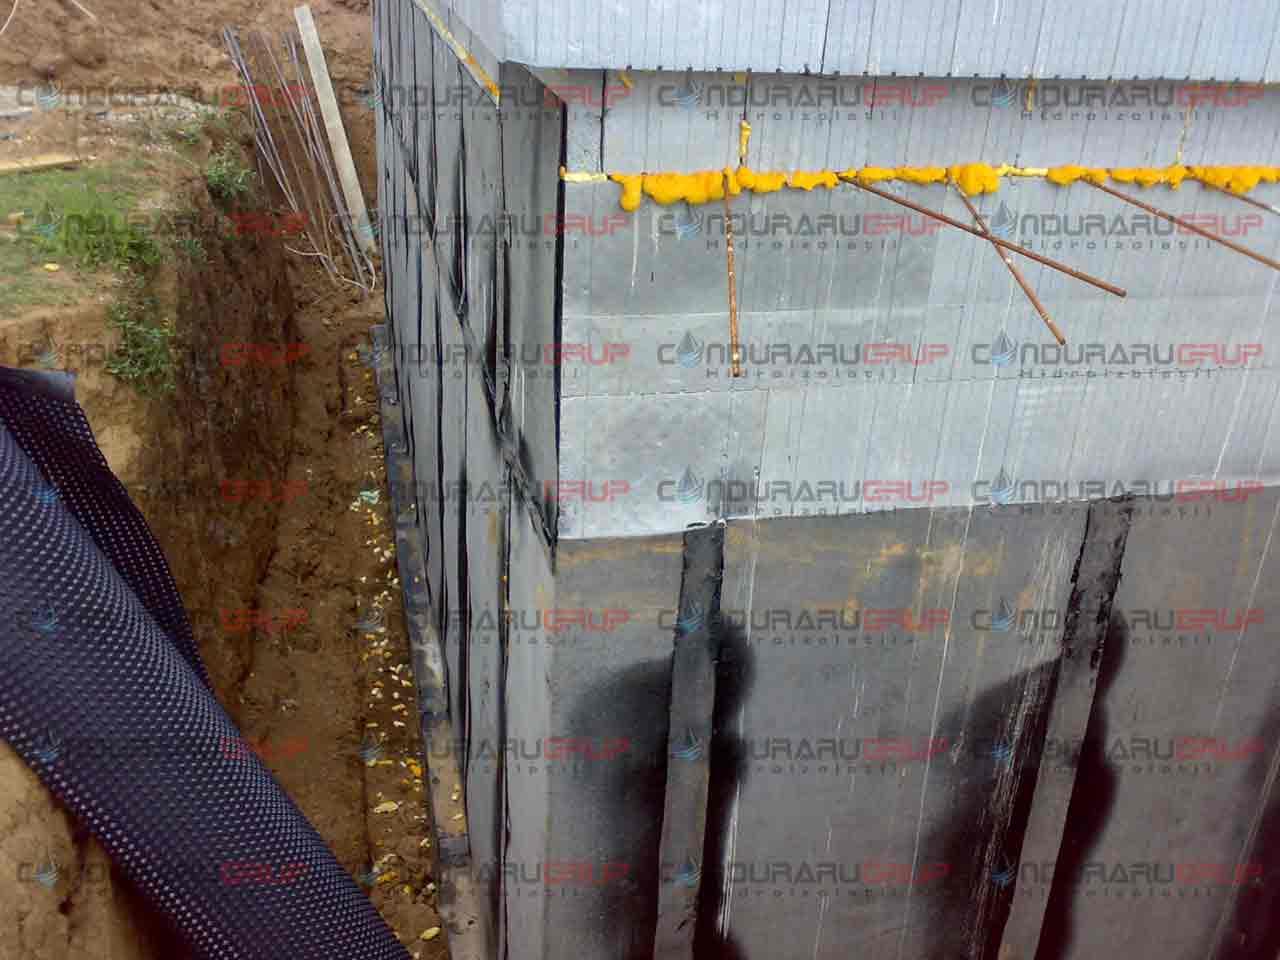 Constructie sistem Amvic CONDURARU GRUP - Poza 6